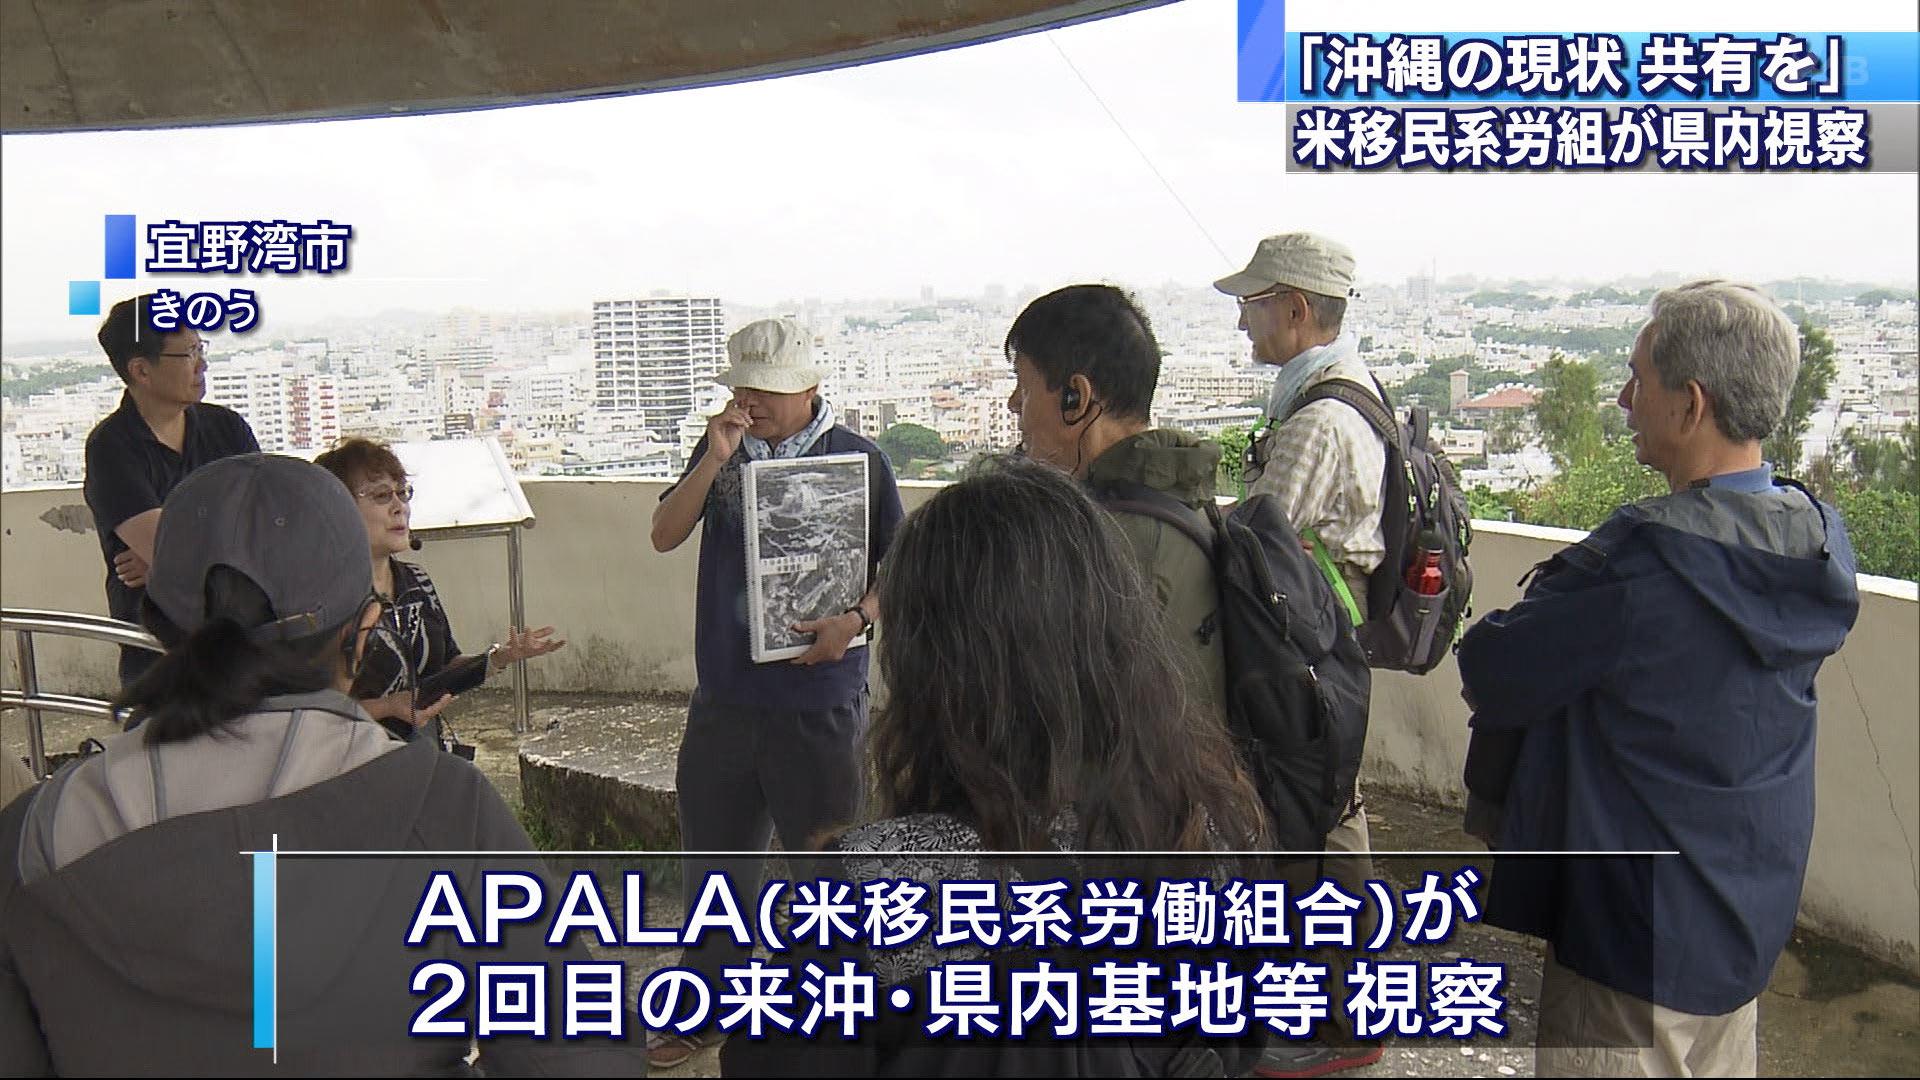 APALA沖縄訪問